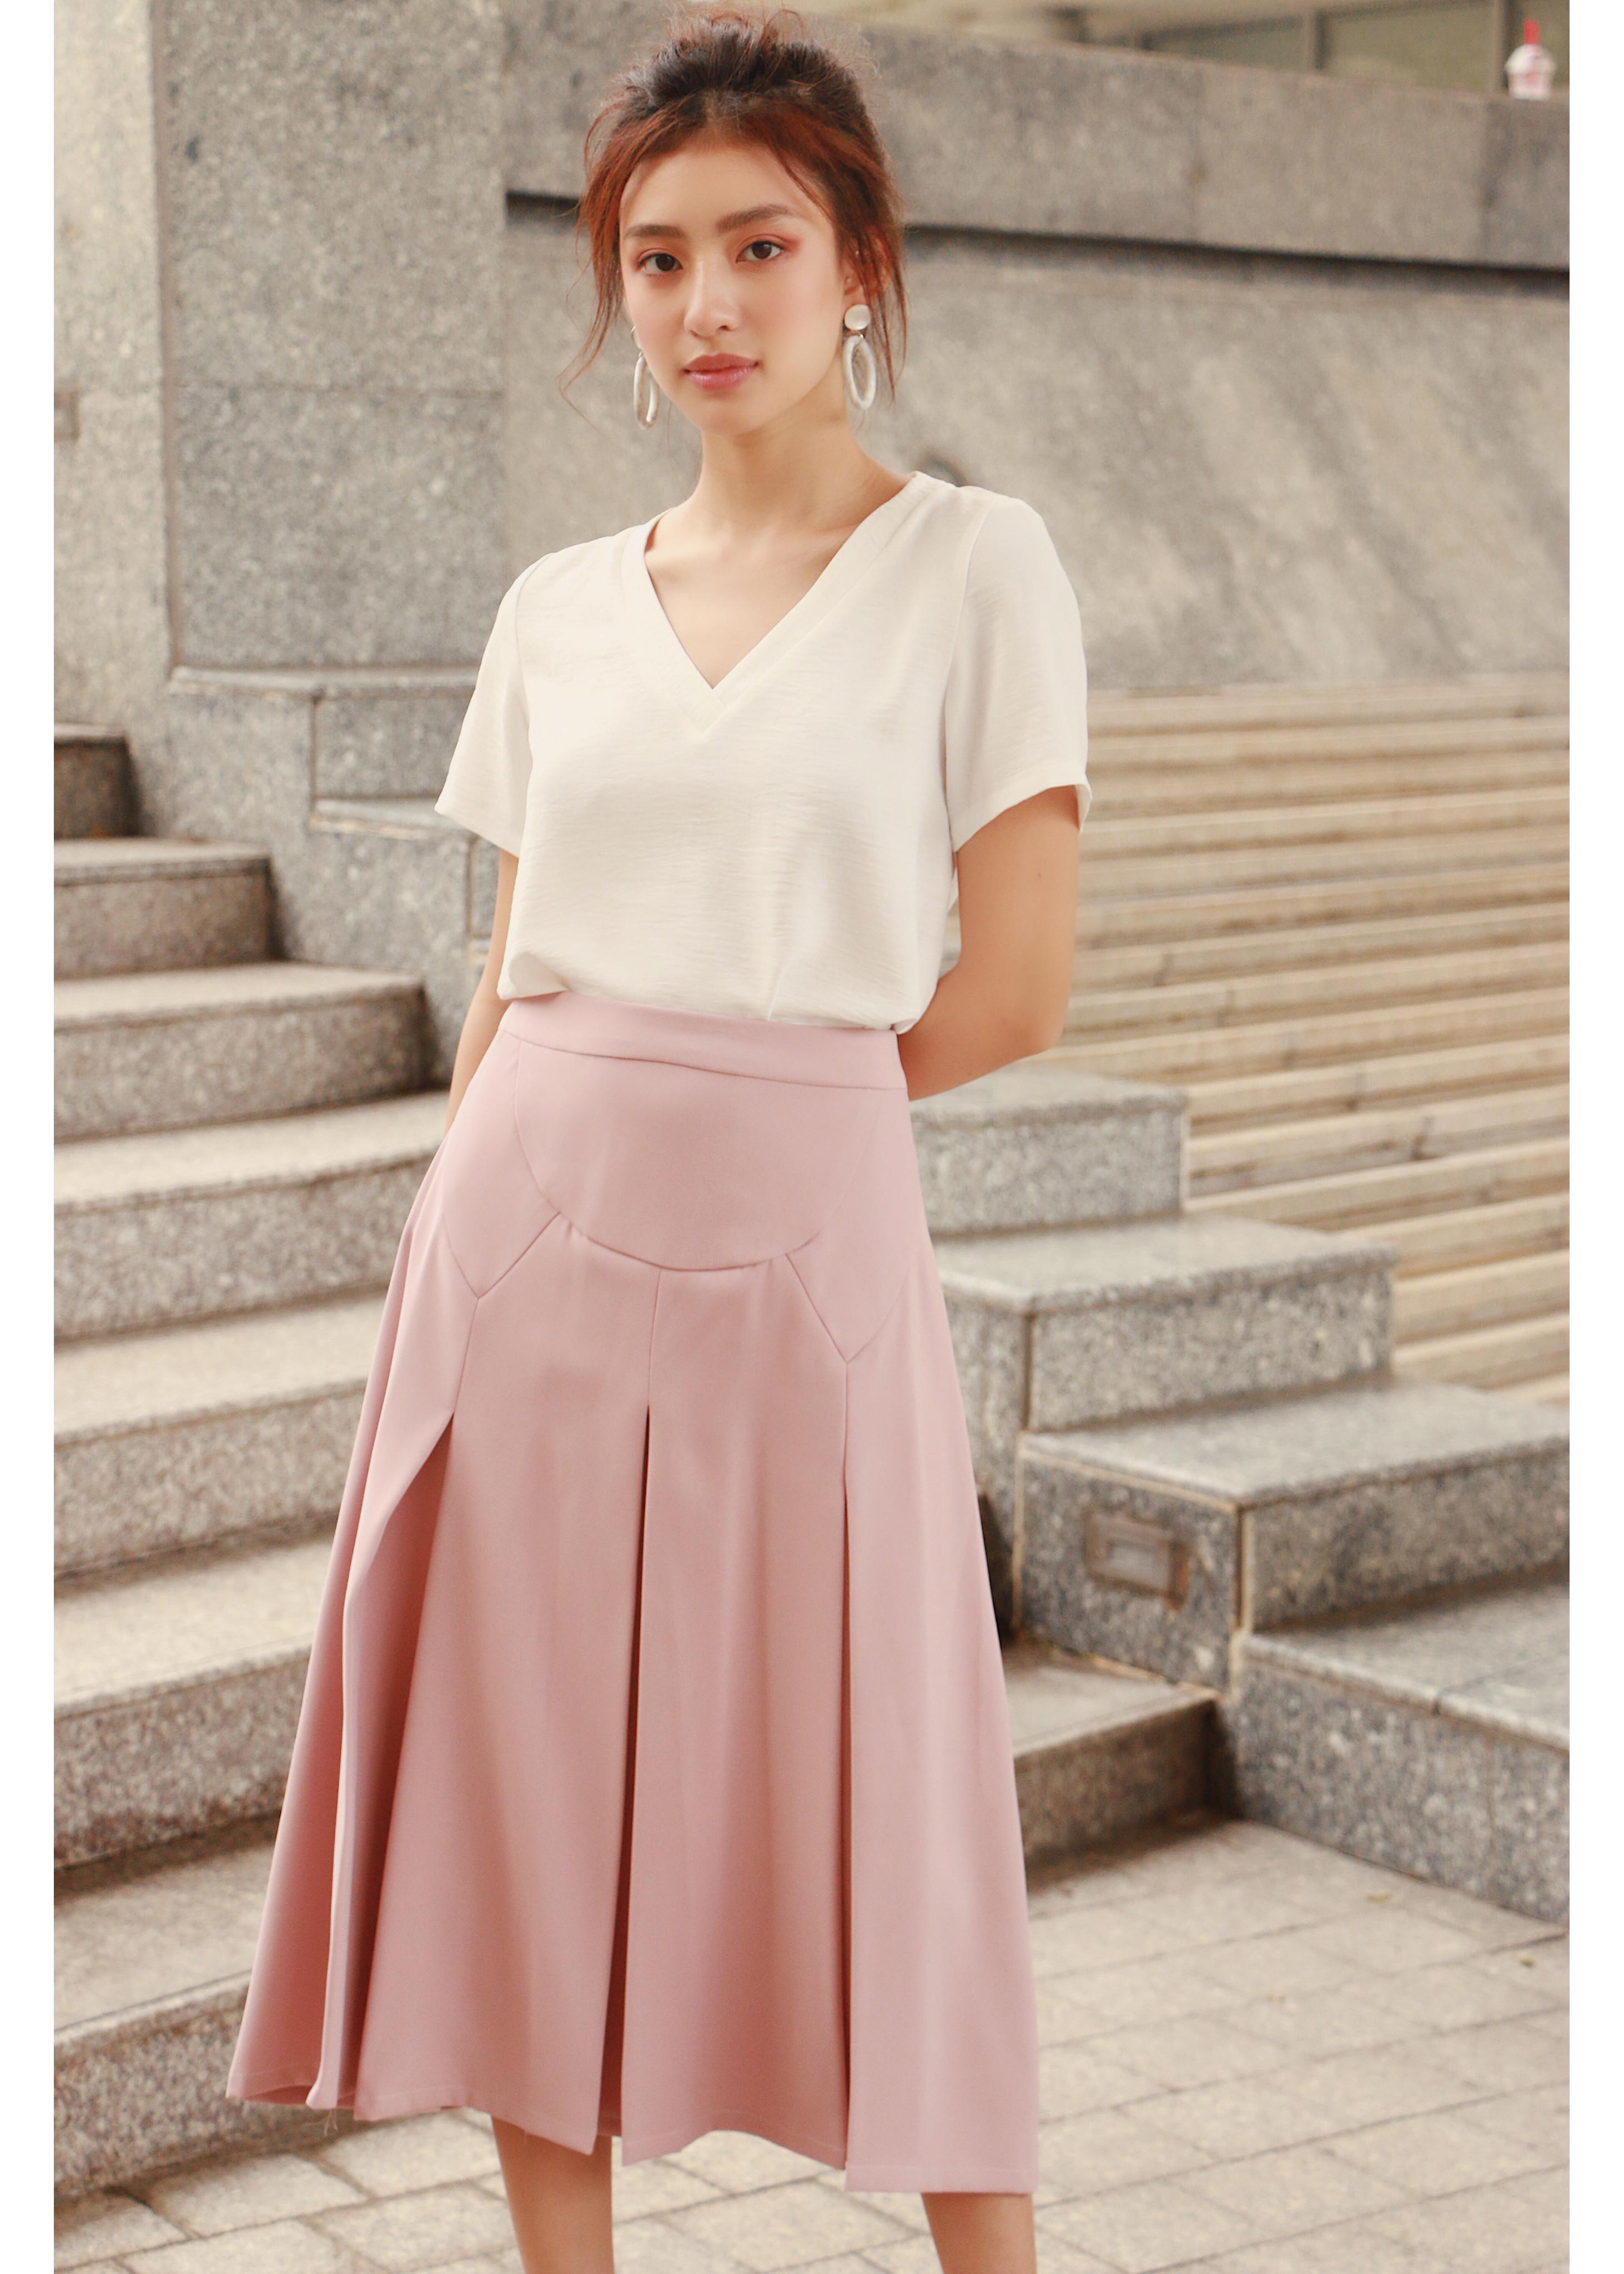 Váy xếp ly hồng EVERLUXE